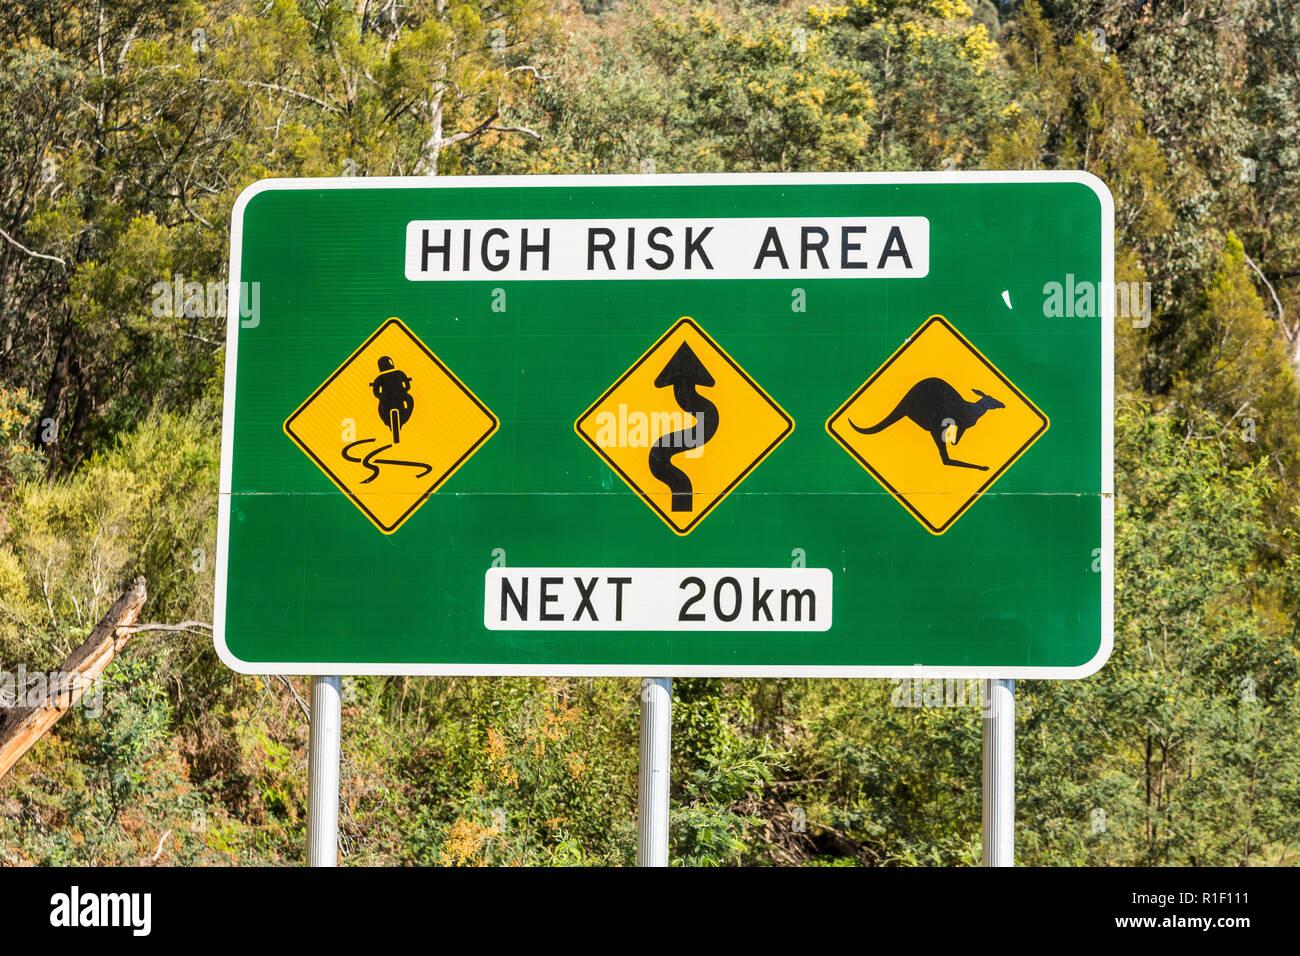 High Risk Area Next 20km Road Sign slippery windy kangaroos Stock Photo